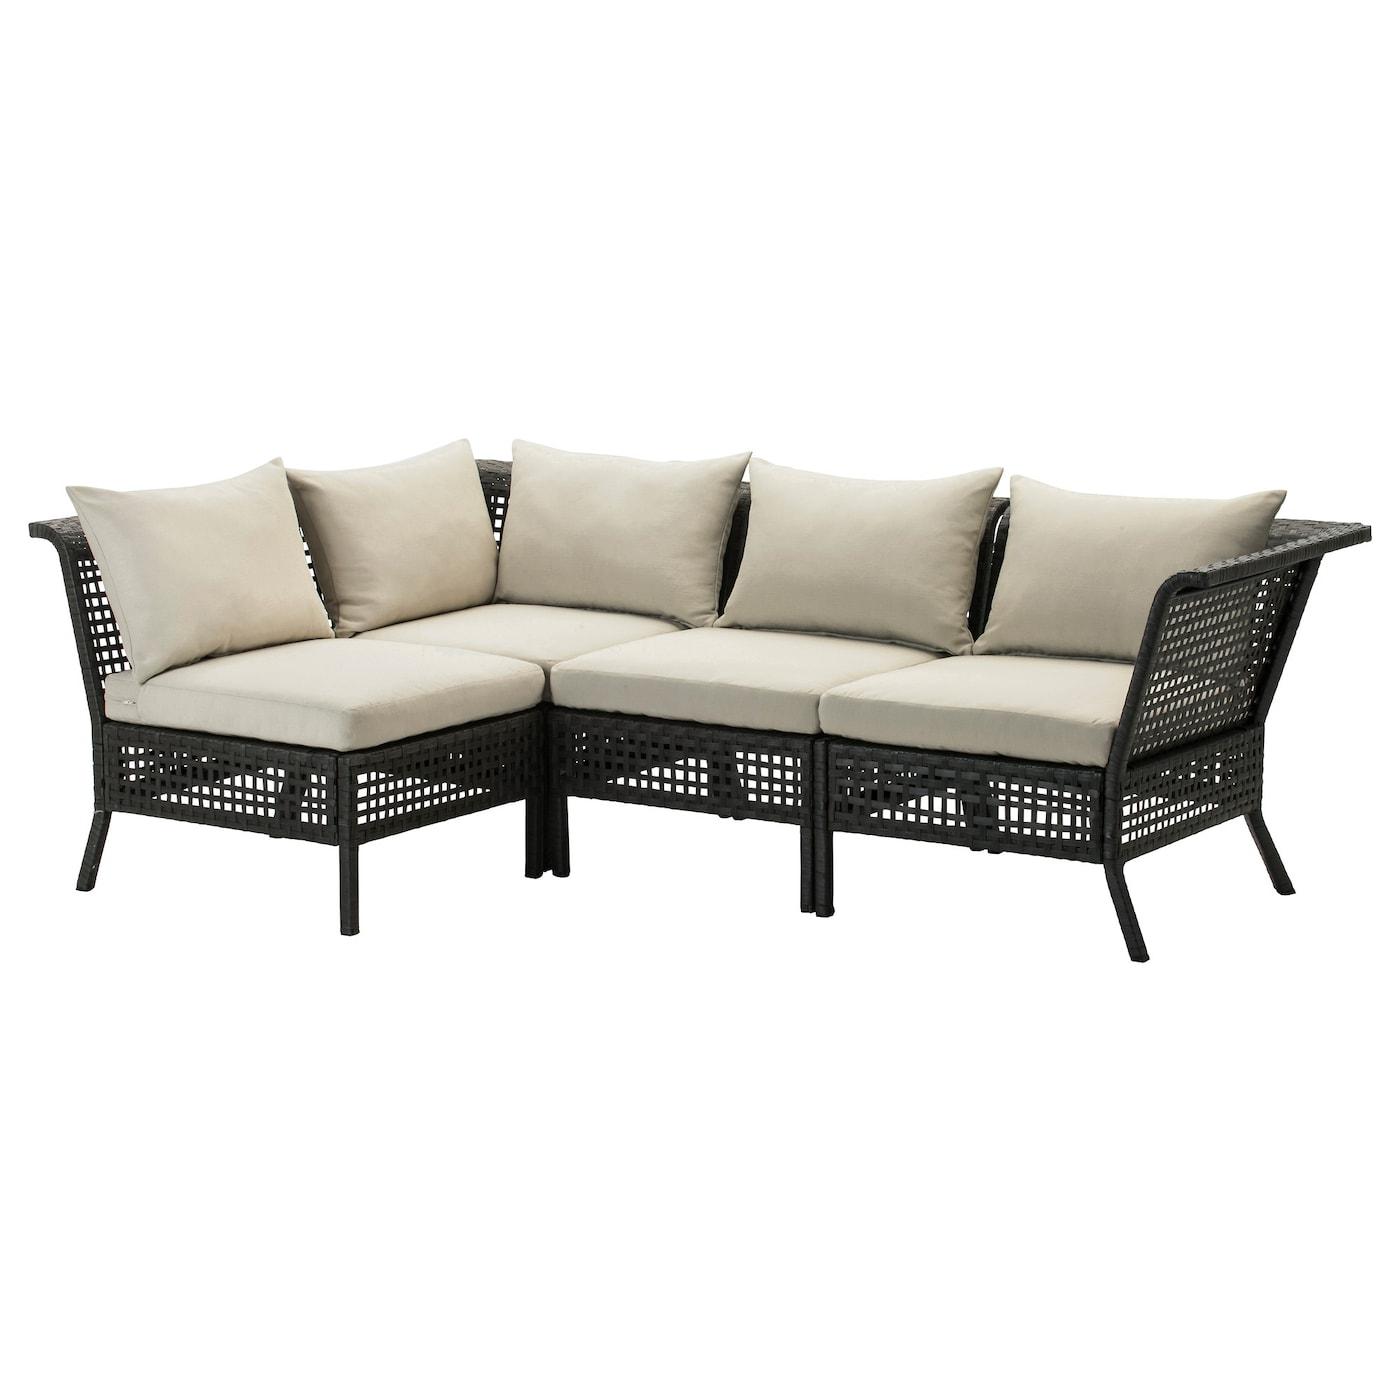 outdoor garden sofas ikea. Black Bedroom Furniture Sets. Home Design Ideas